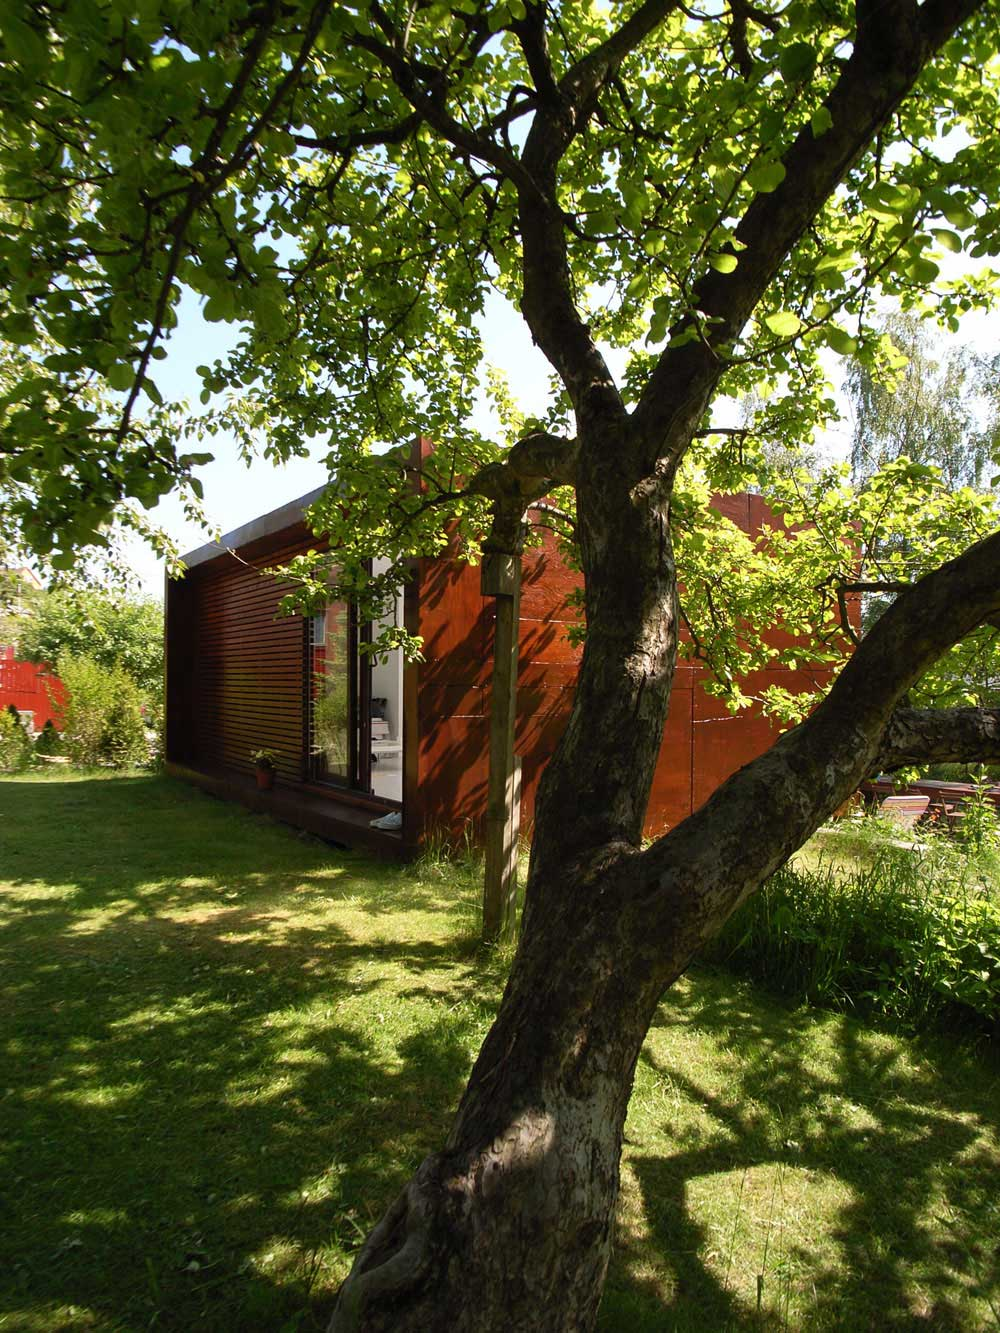 Garden, Casa Kolonihagen in Stavanger, Norway by Tommie Wilhelmsen